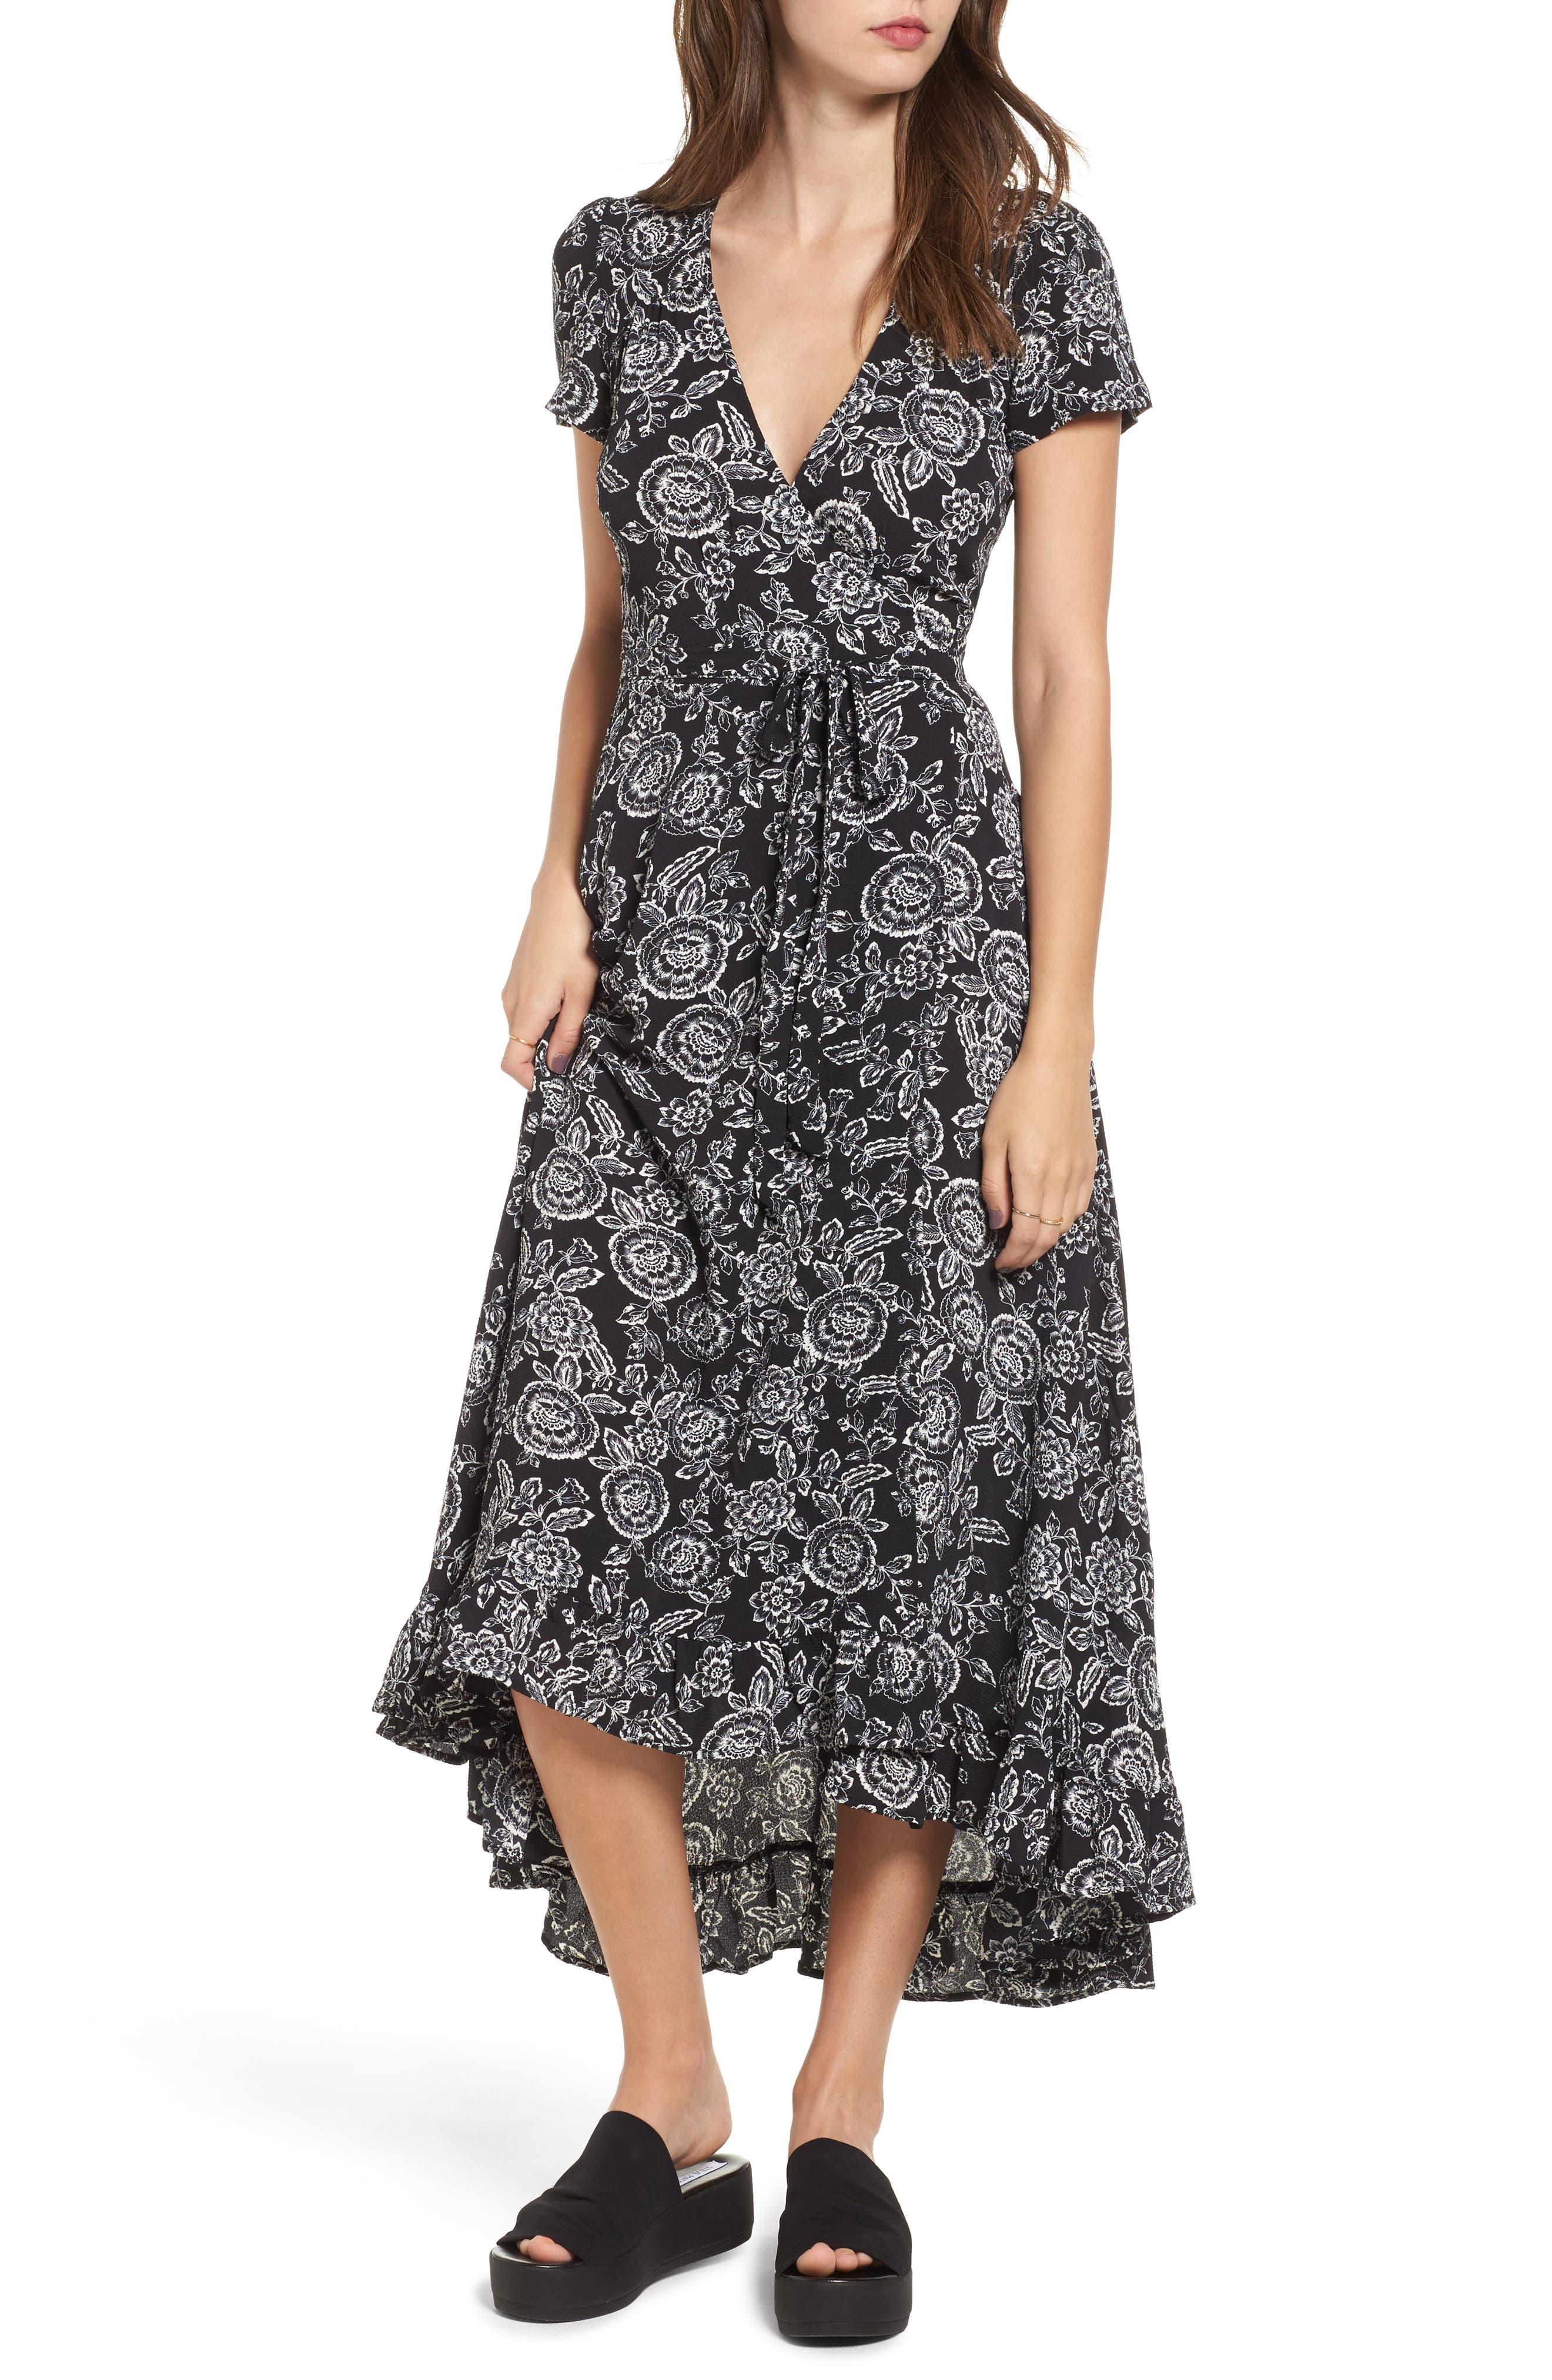 Alternate Image 1 Selected - Lira Clothing Arabella Wrap Dress